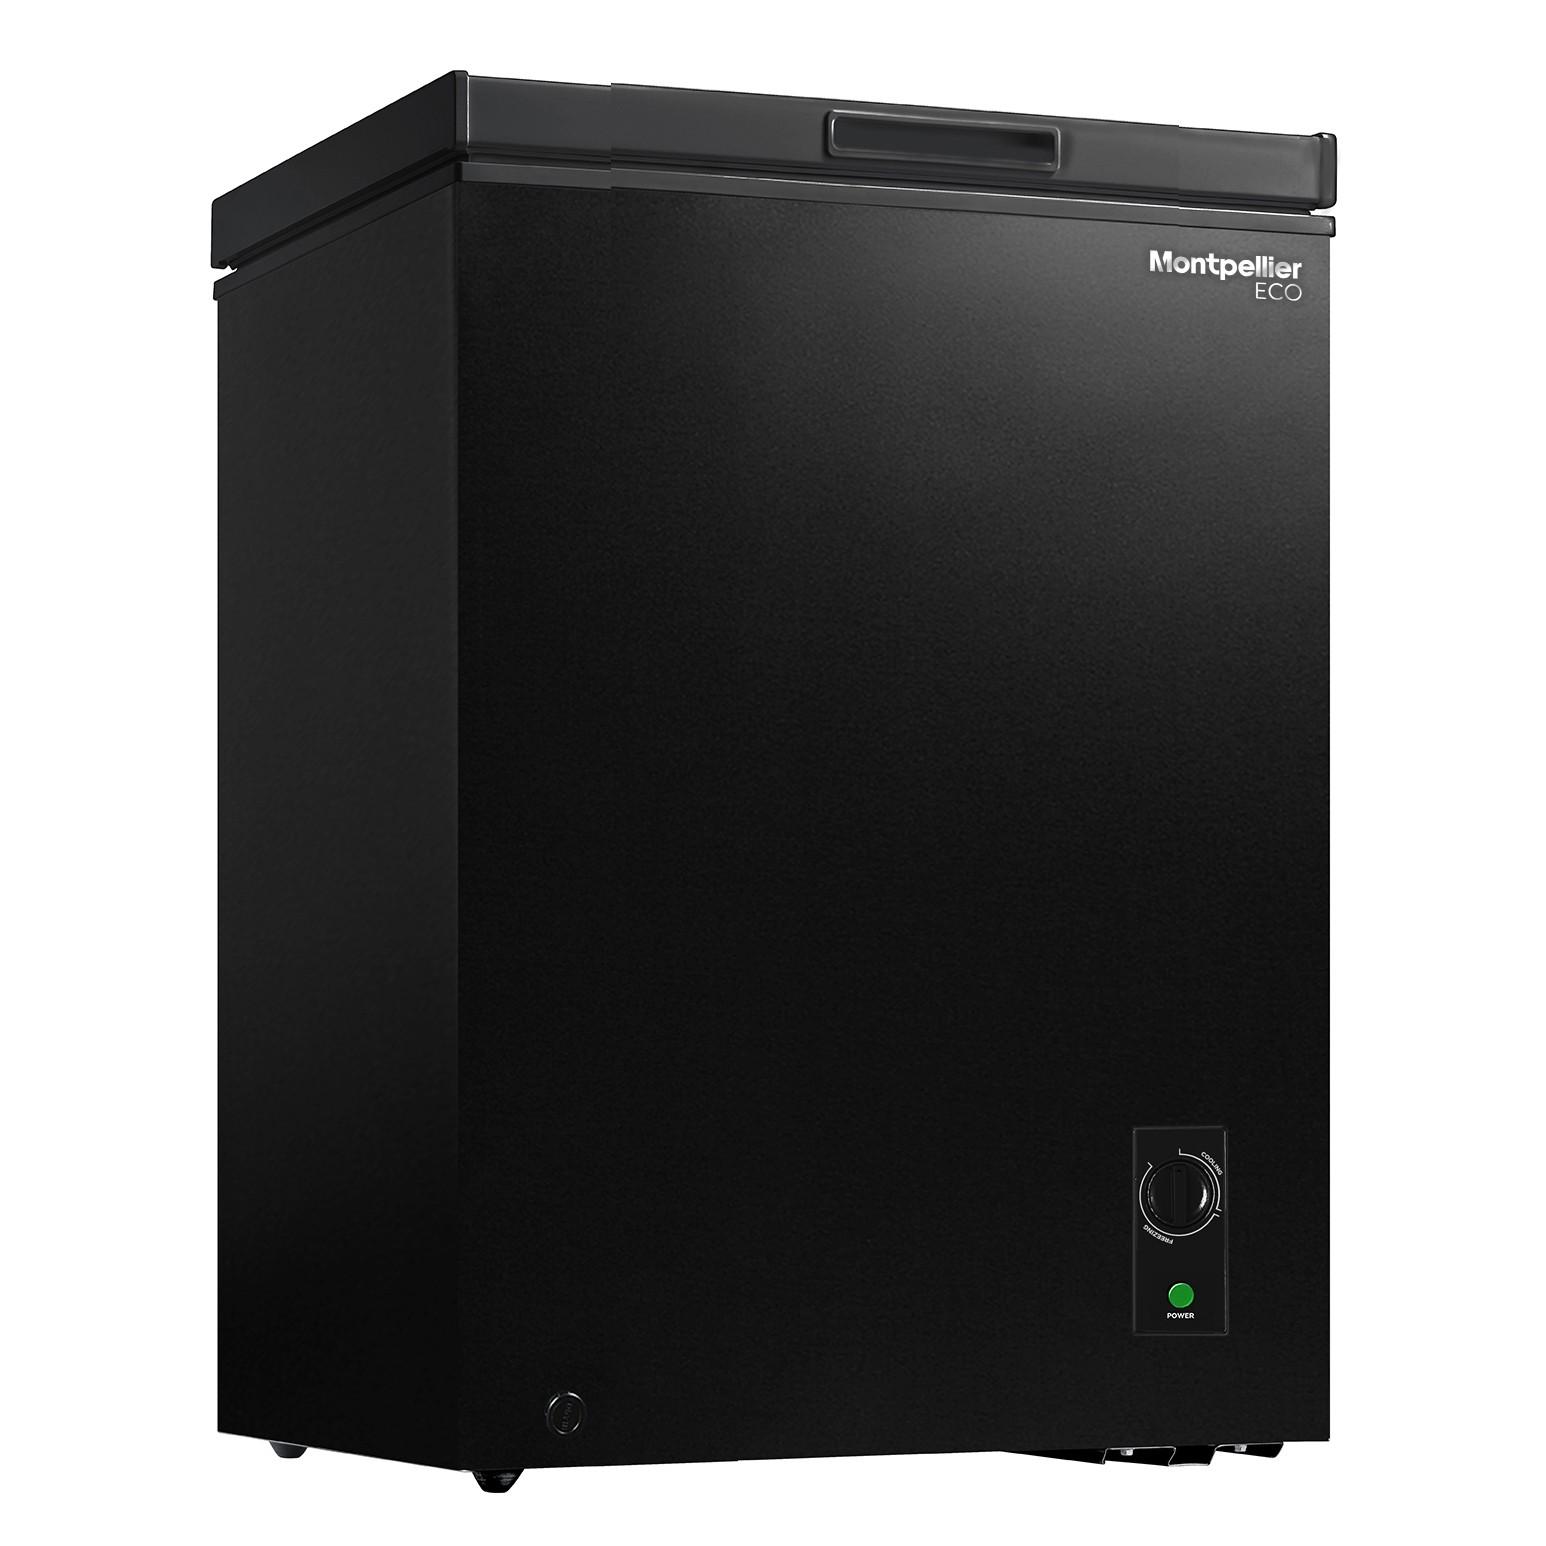 Montpellier MCF99BK-ECO Chest Freezer